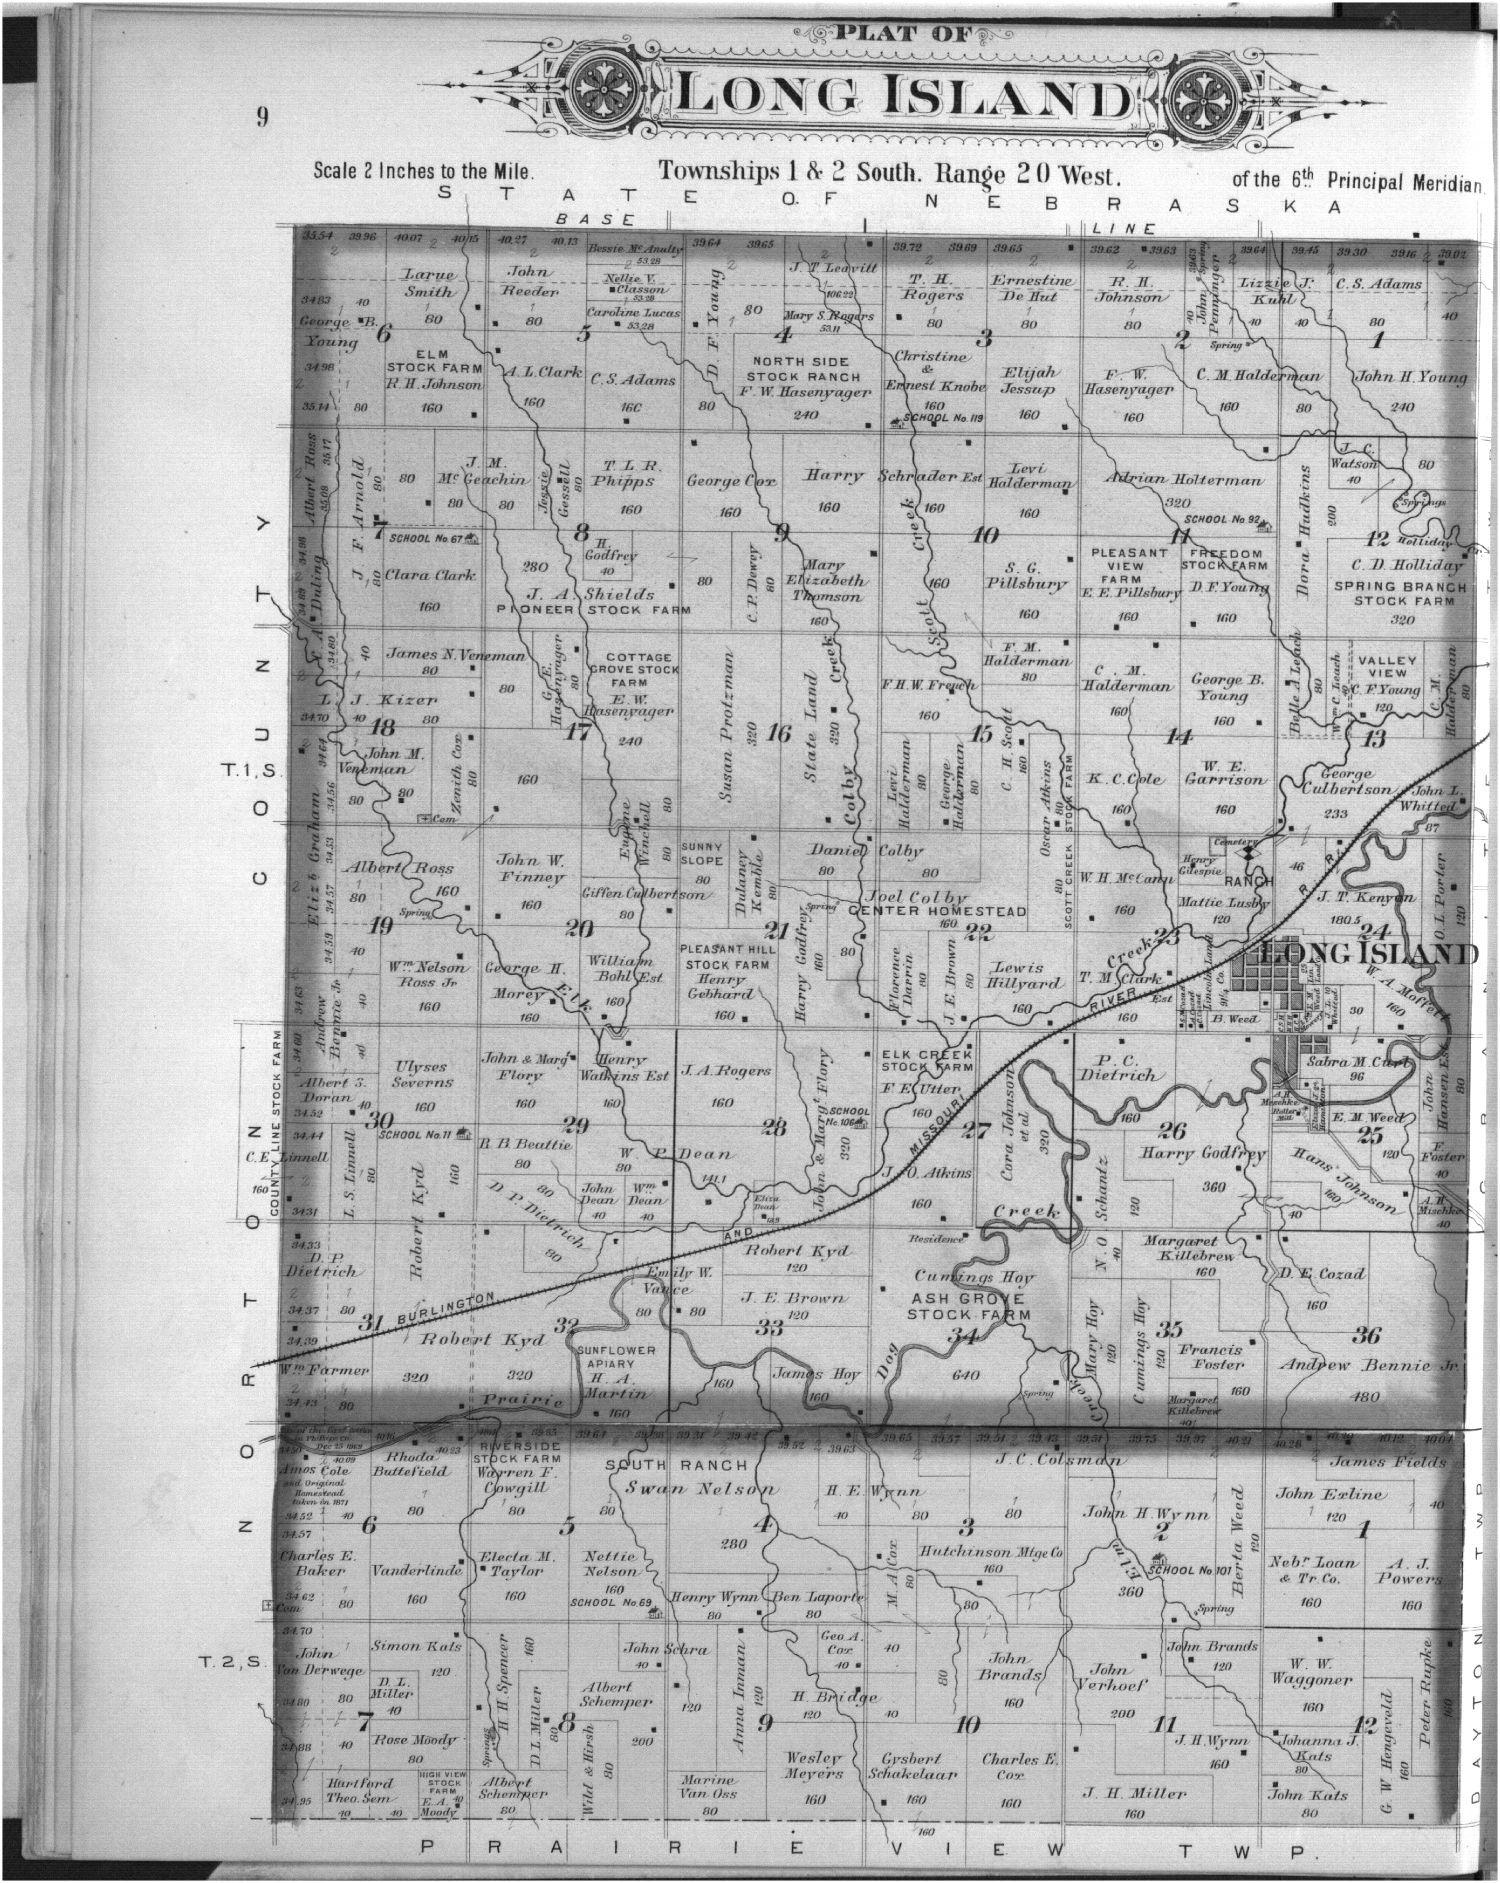 Plat book, Phillips County, Kansas - 9